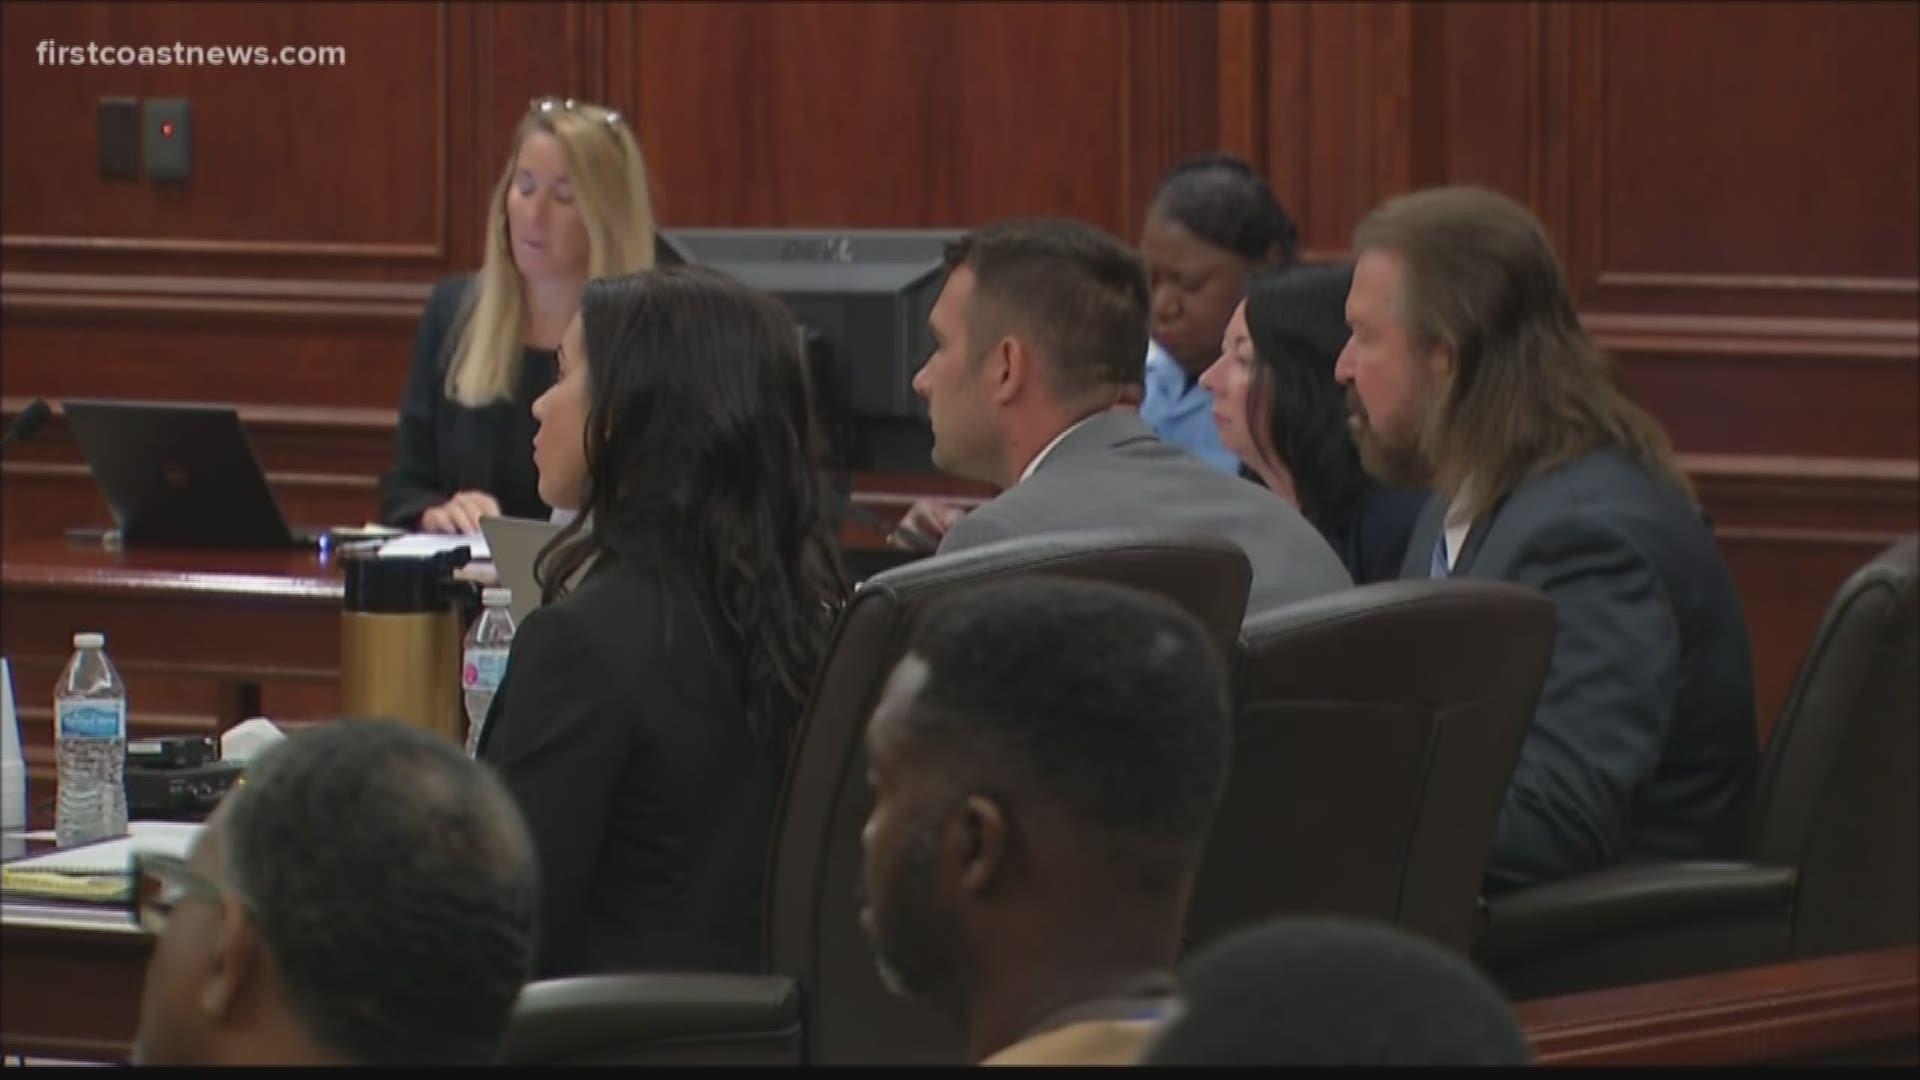 Robert Olsen trial: Split verdict for ex-cop who fatally